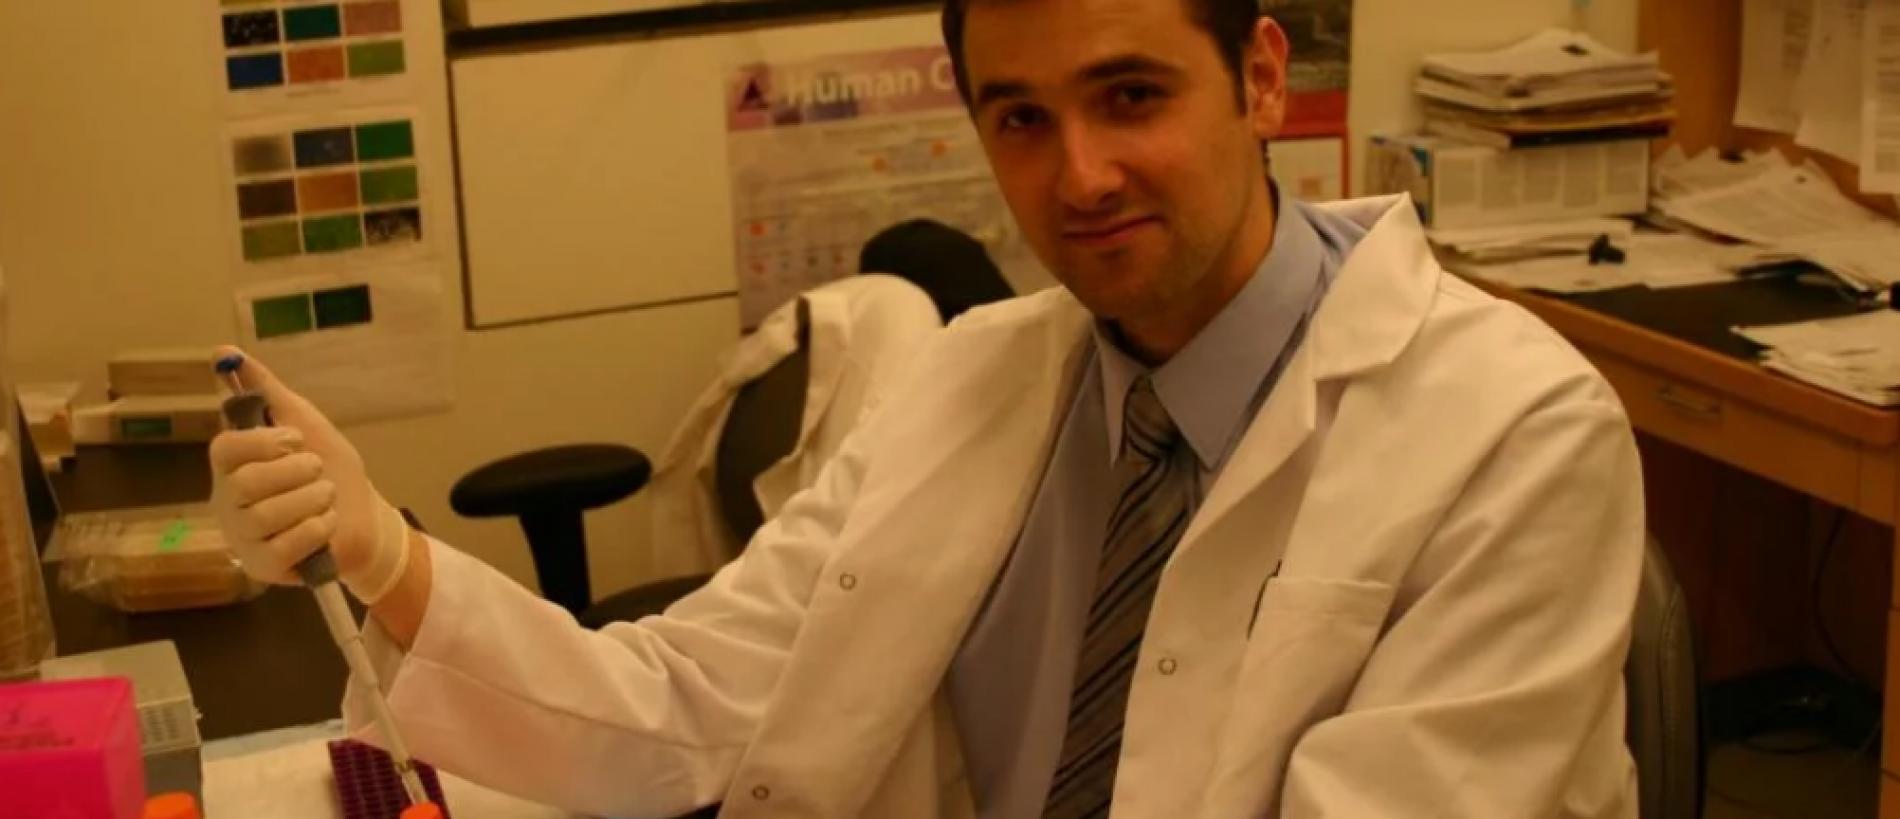 Uspjeh bosanskog naučnika u SAD: Dr. Muhamed Baljević u Nebraski izvršio prvi beskrvni transplant